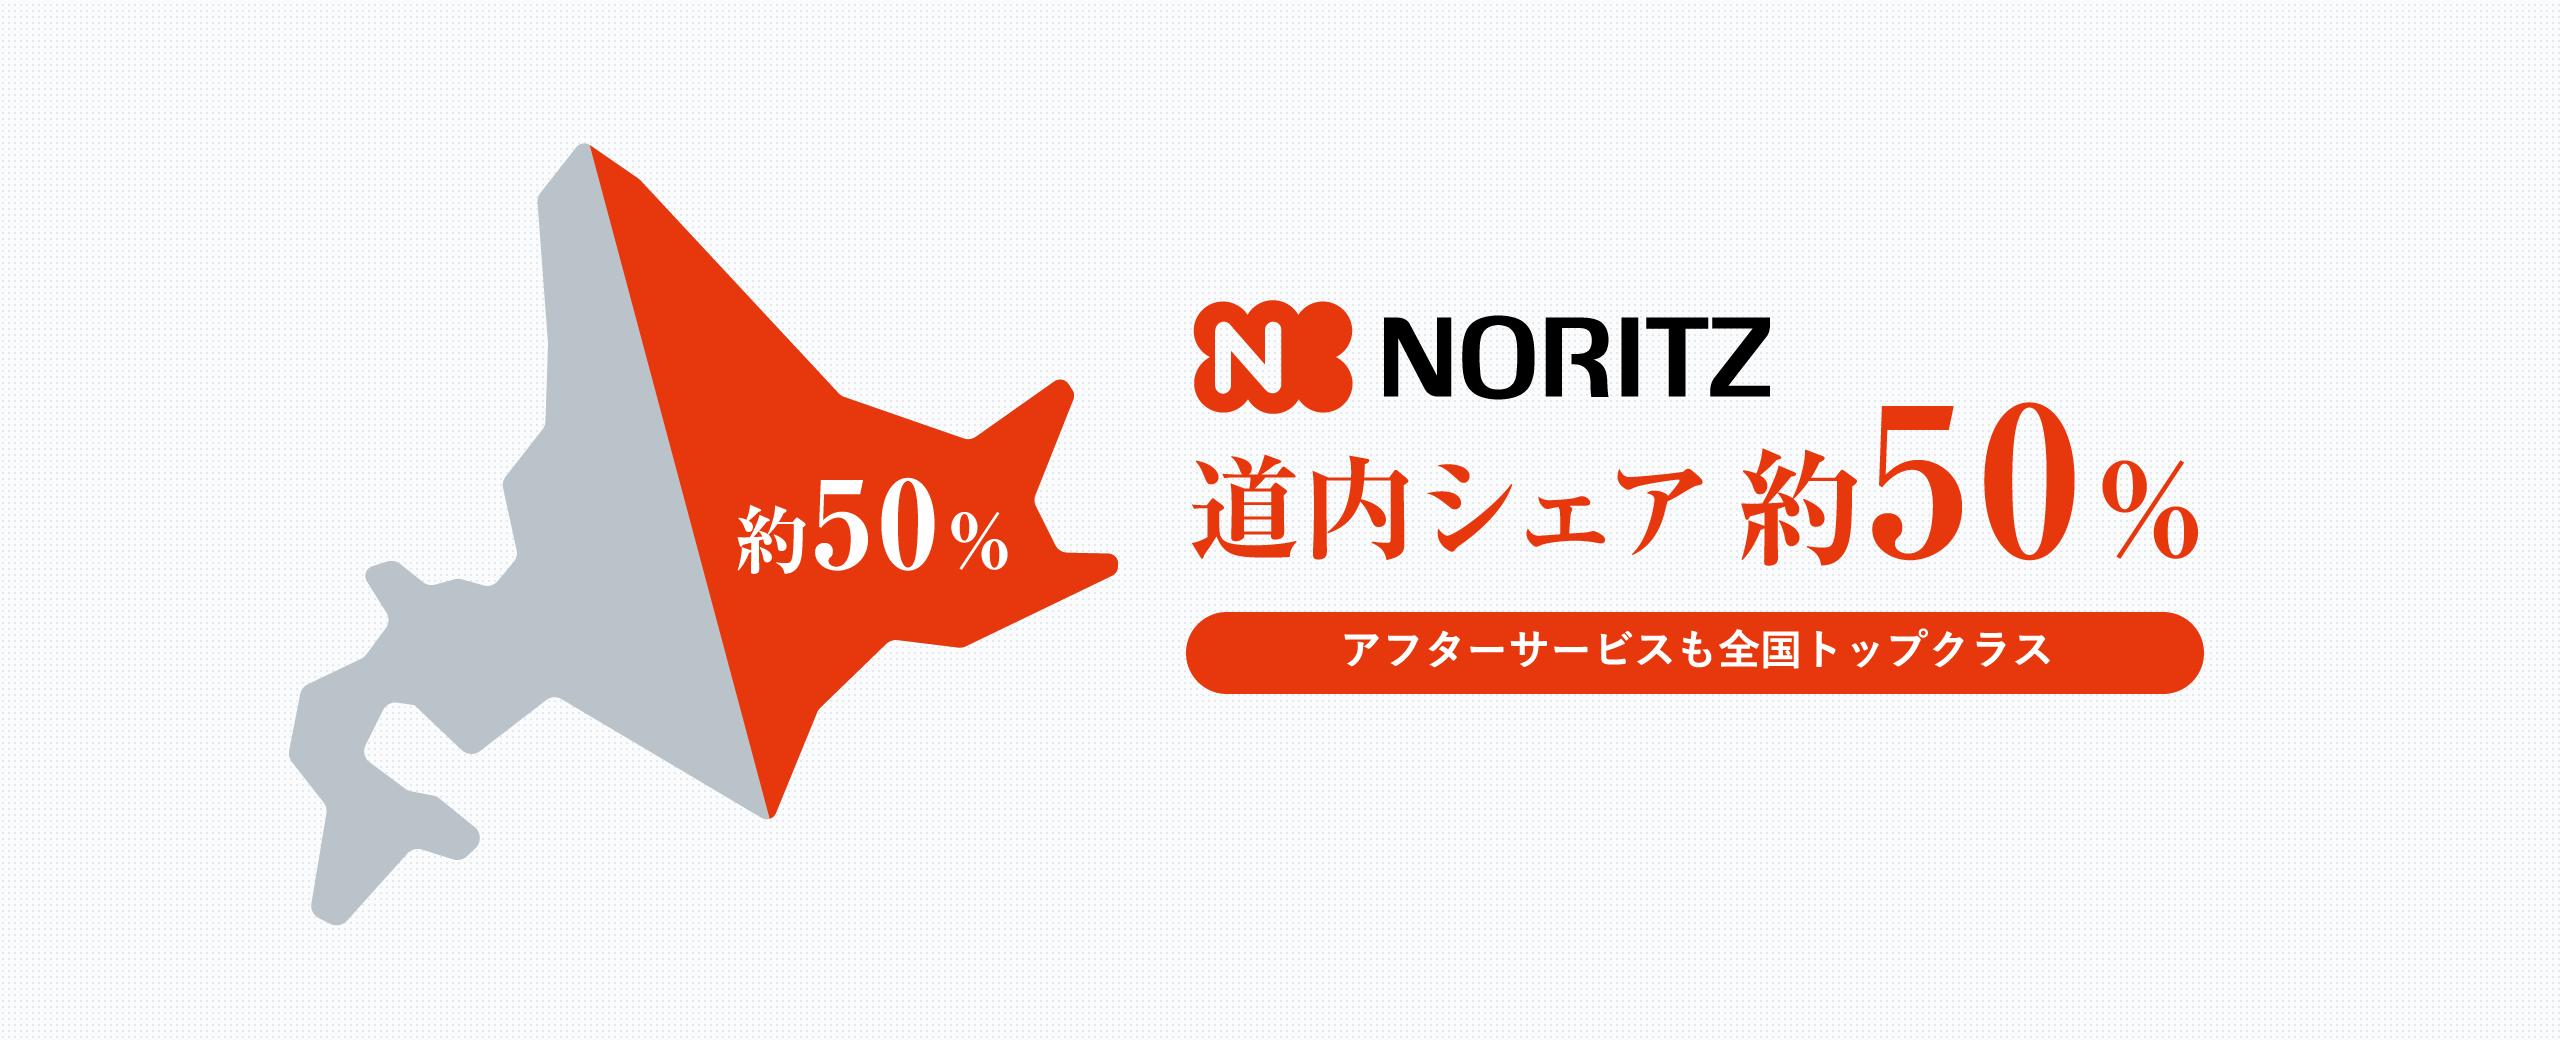 NORITZ 道内シェア約50%。アフターサービスも全国トップクラス